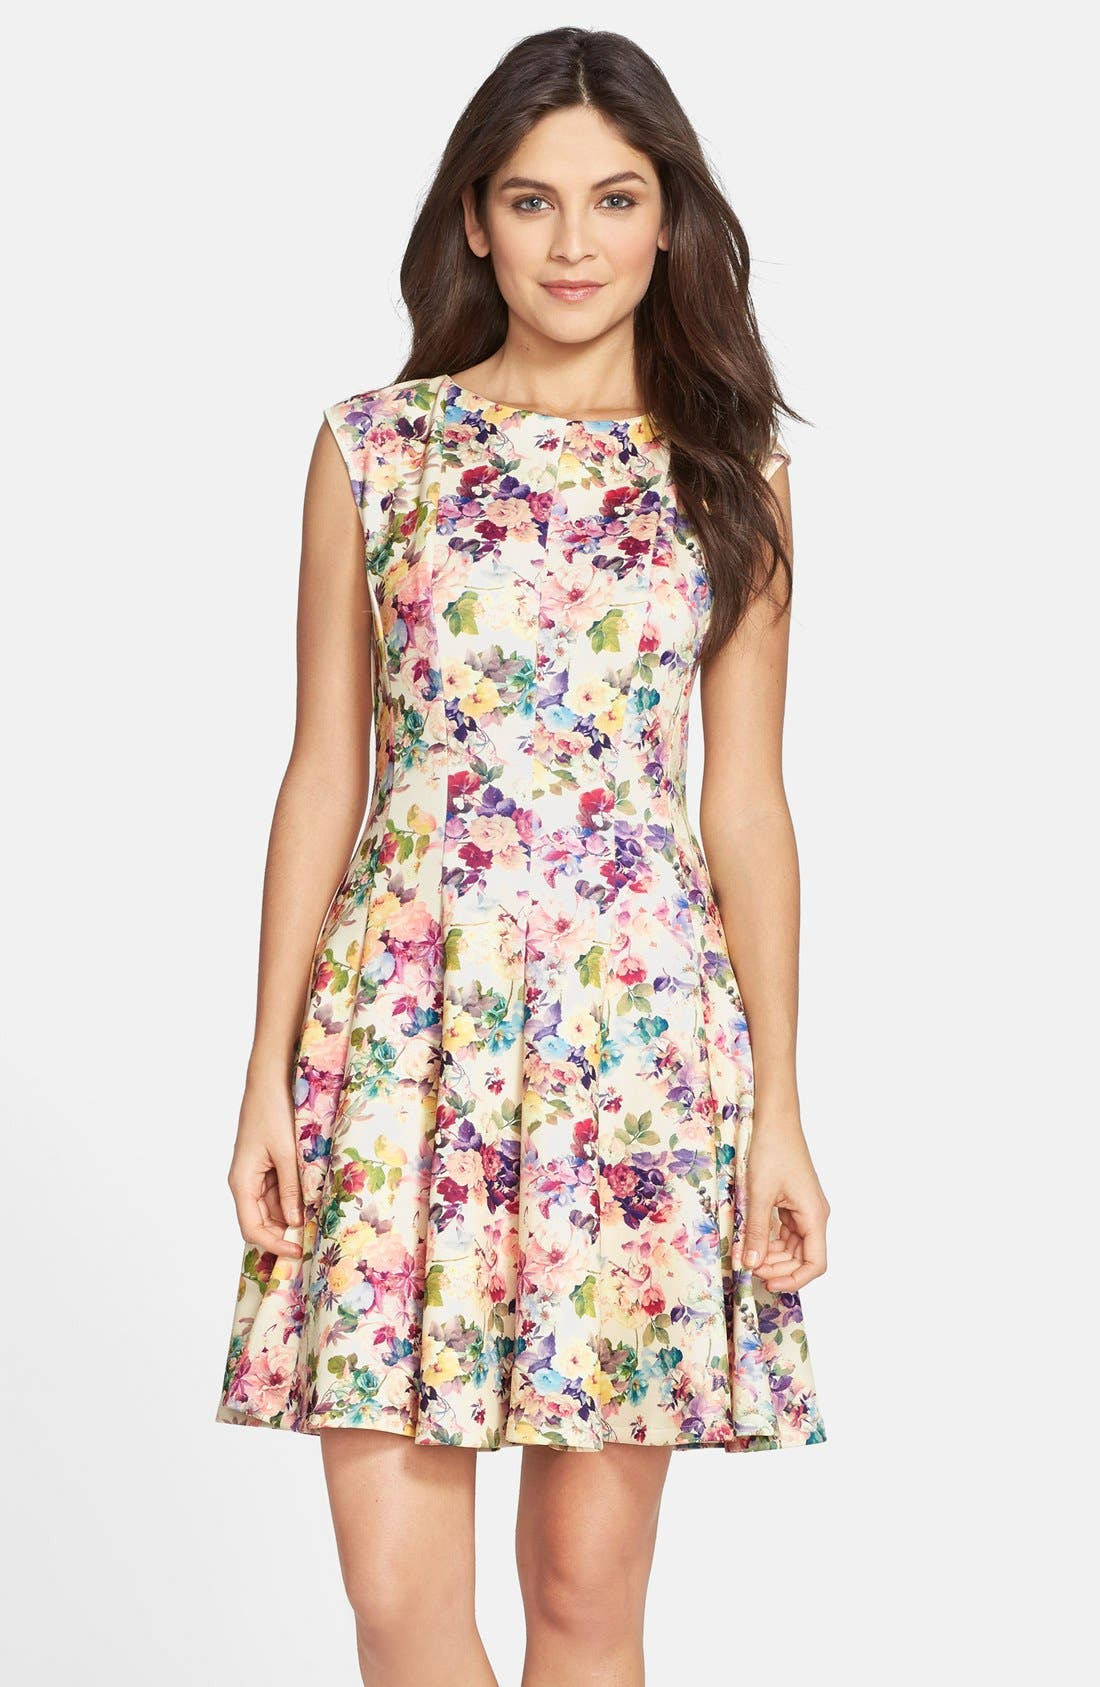 Alternate Image 1 Selected - Gabby Skye Floral Print Scuba Fit & Flare Dress